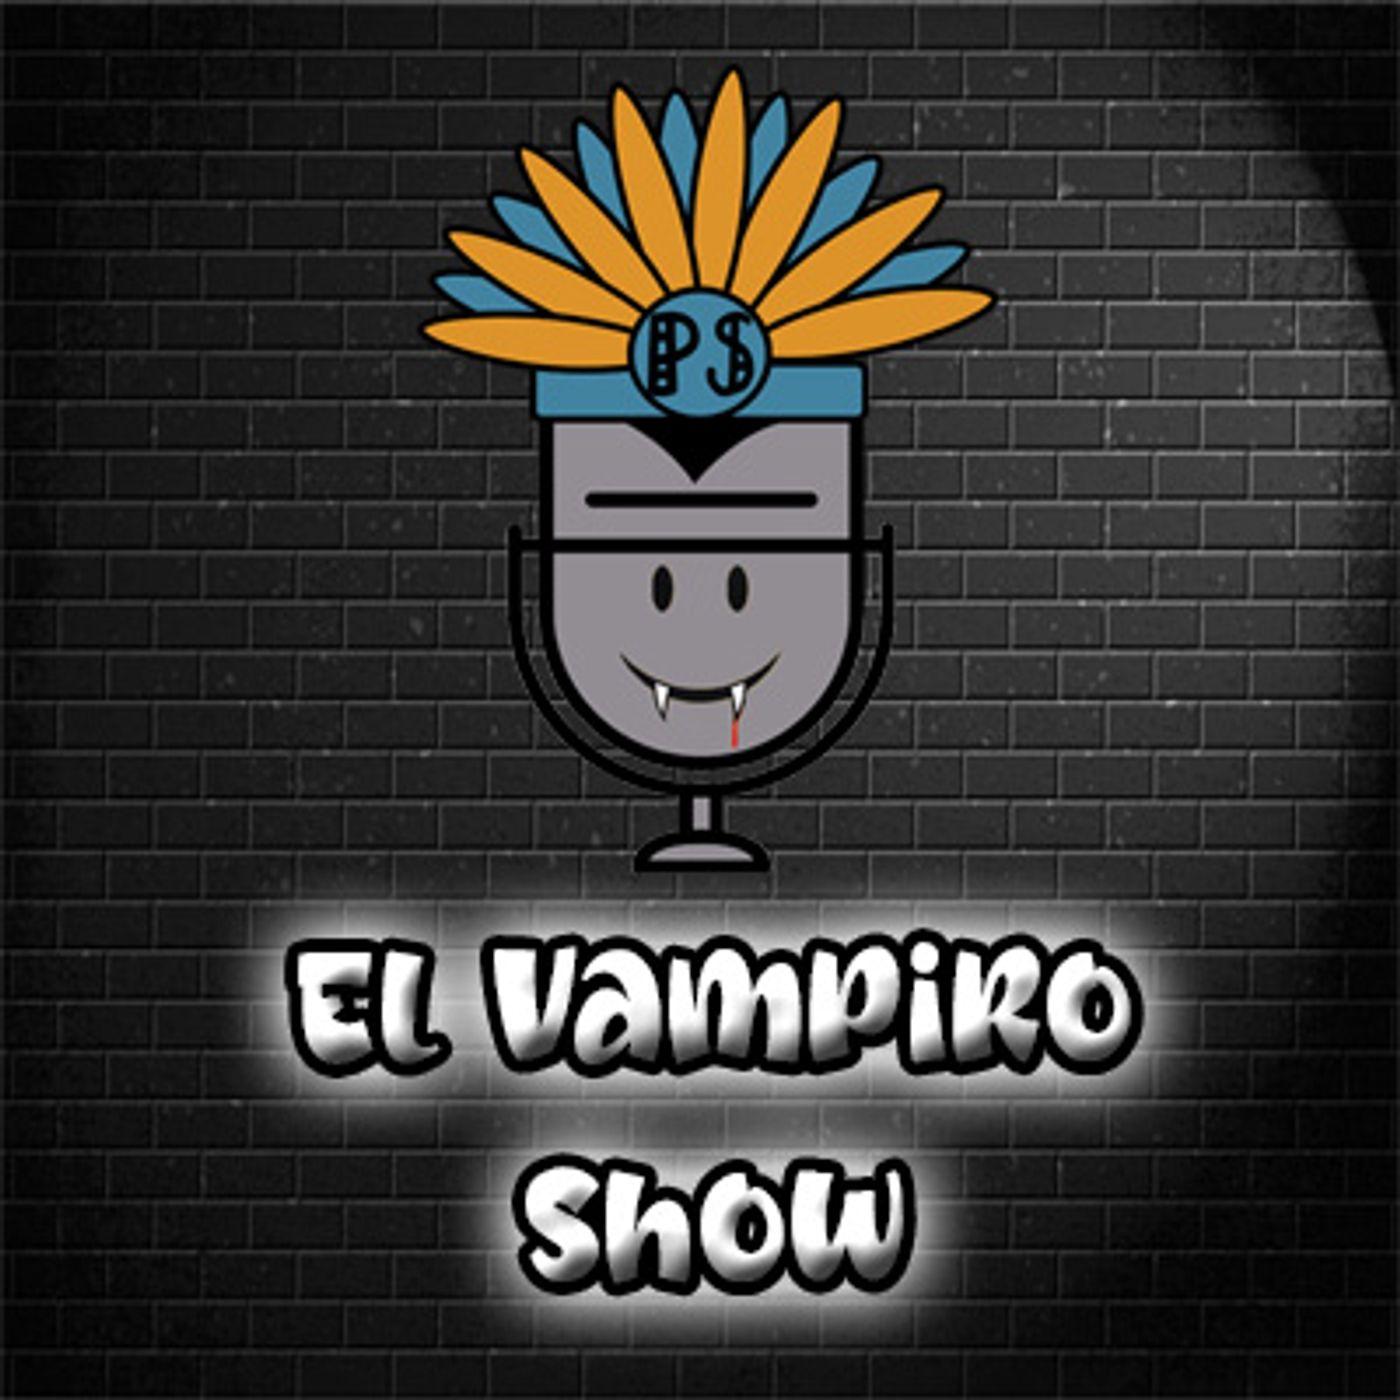 El penacho show - el vampiro show